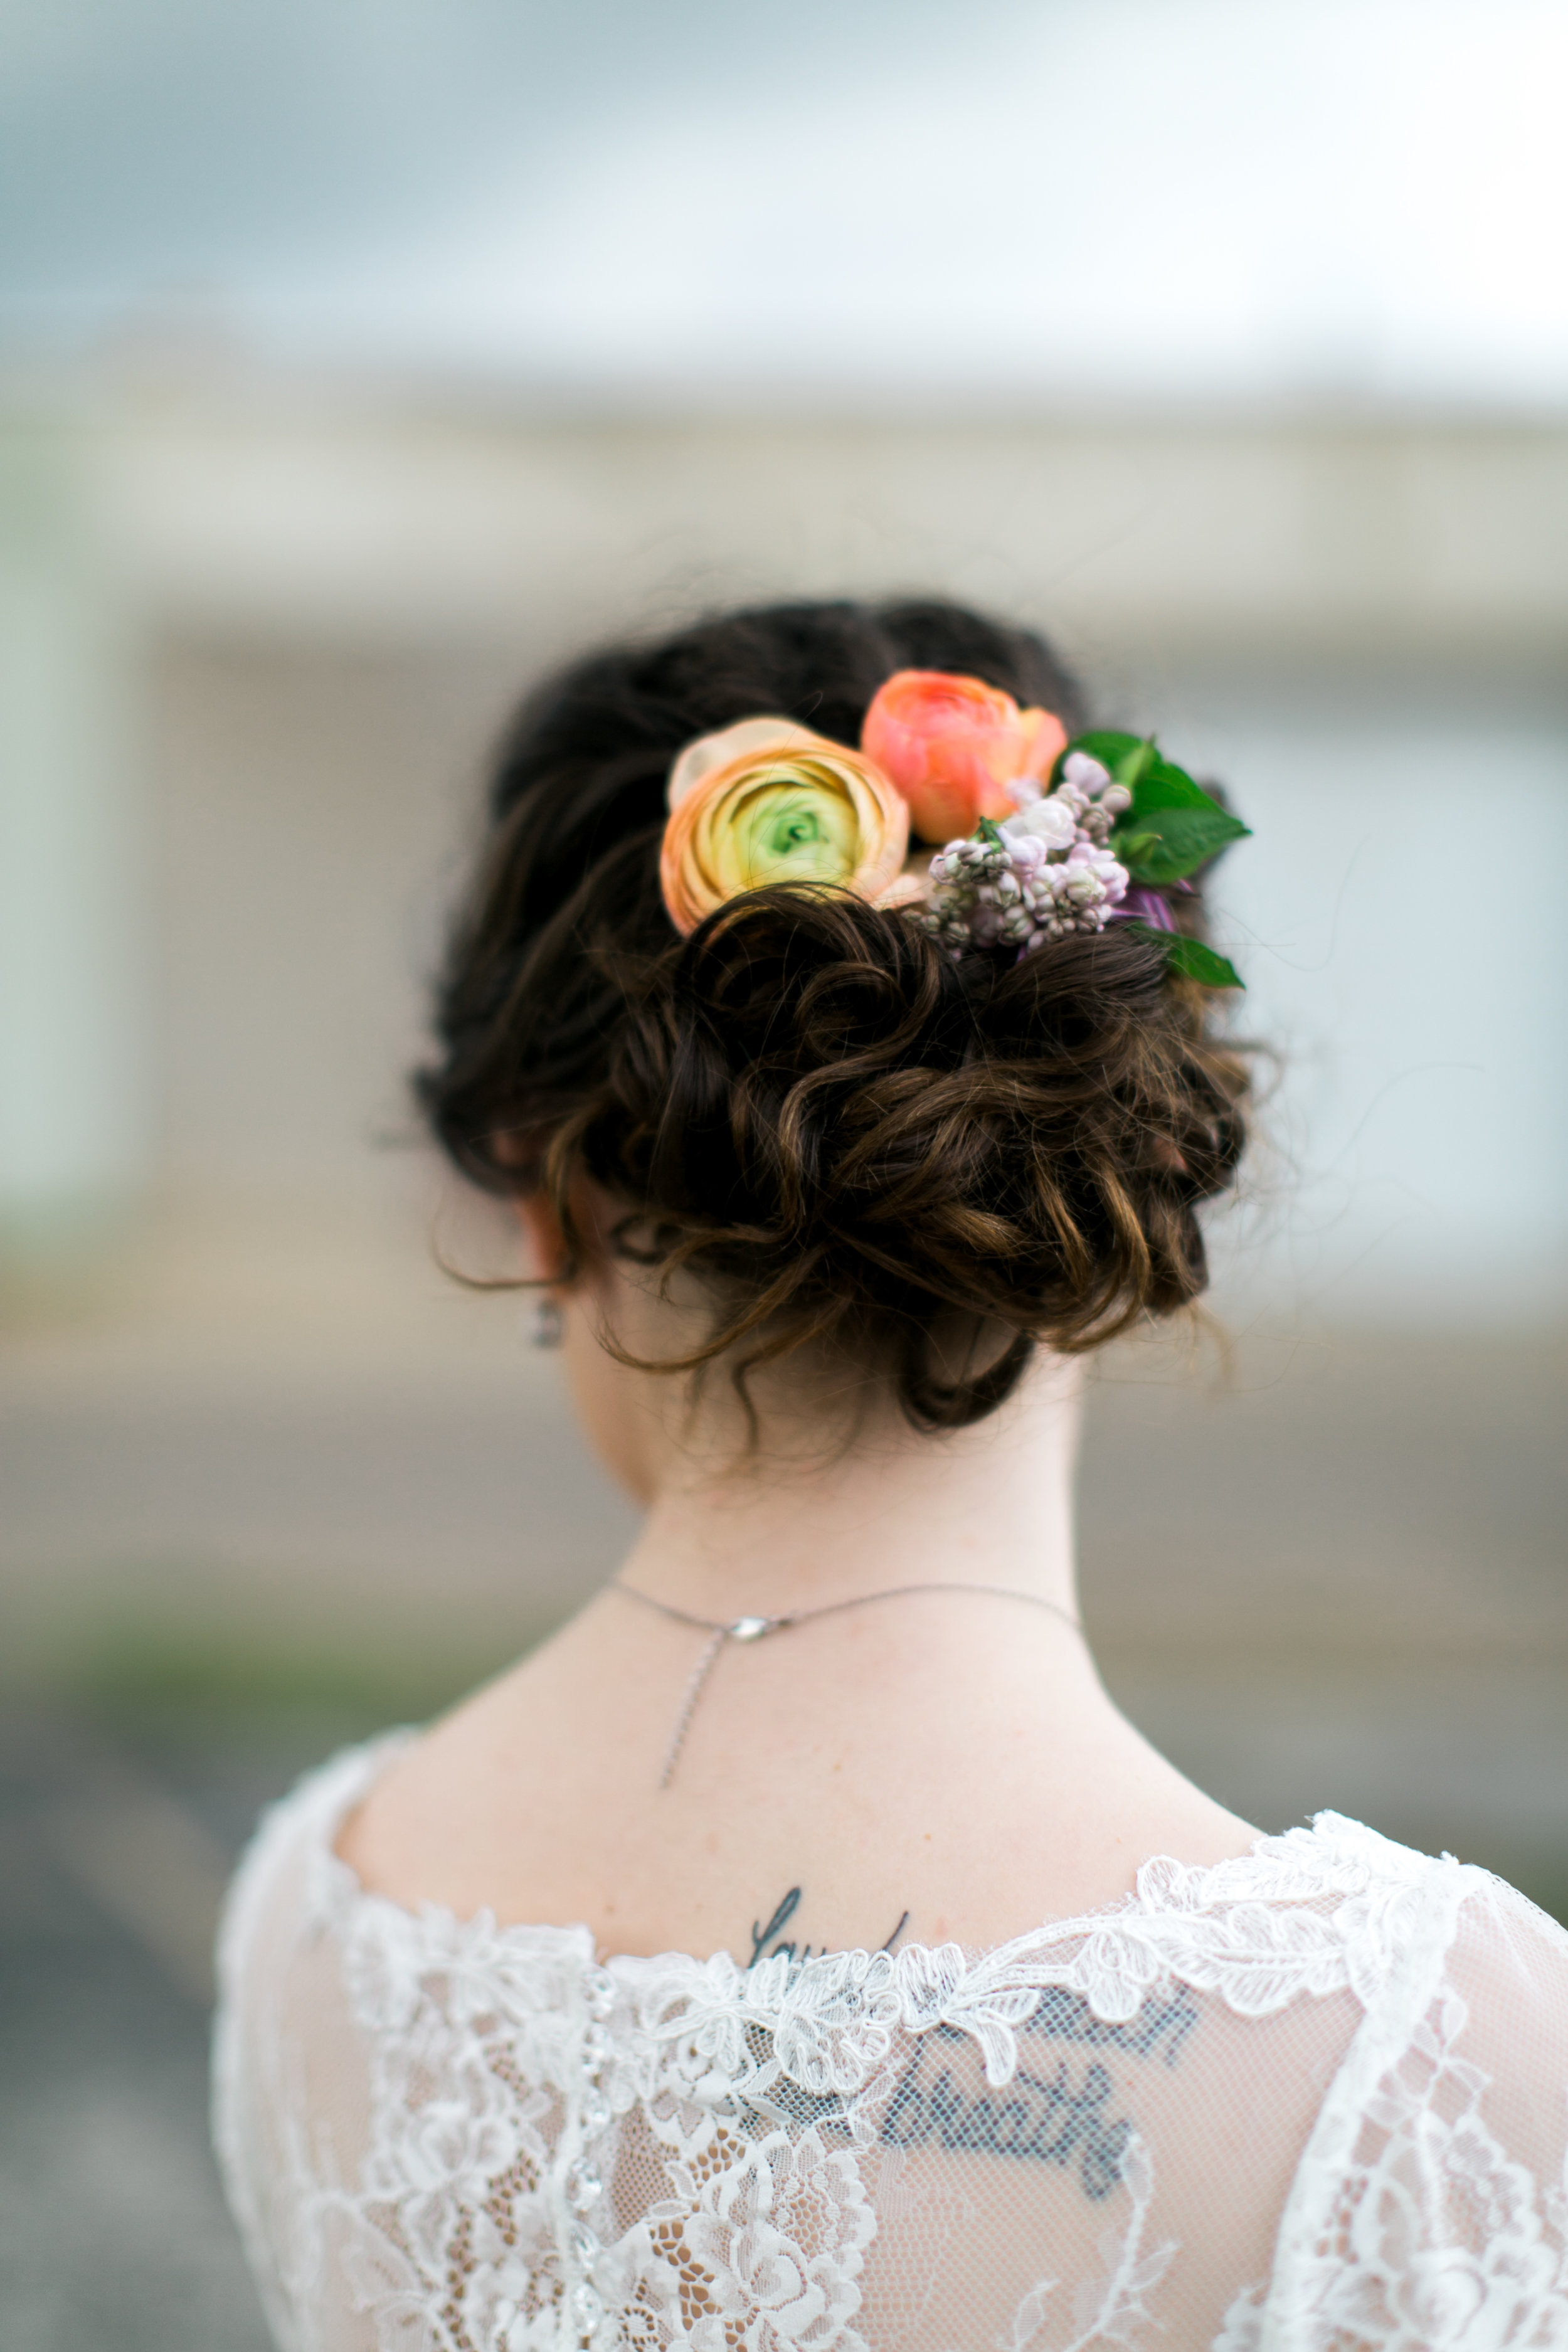 wedding floral hair piece design by Parie Designs, Amarillo Texas wedding coordination and design